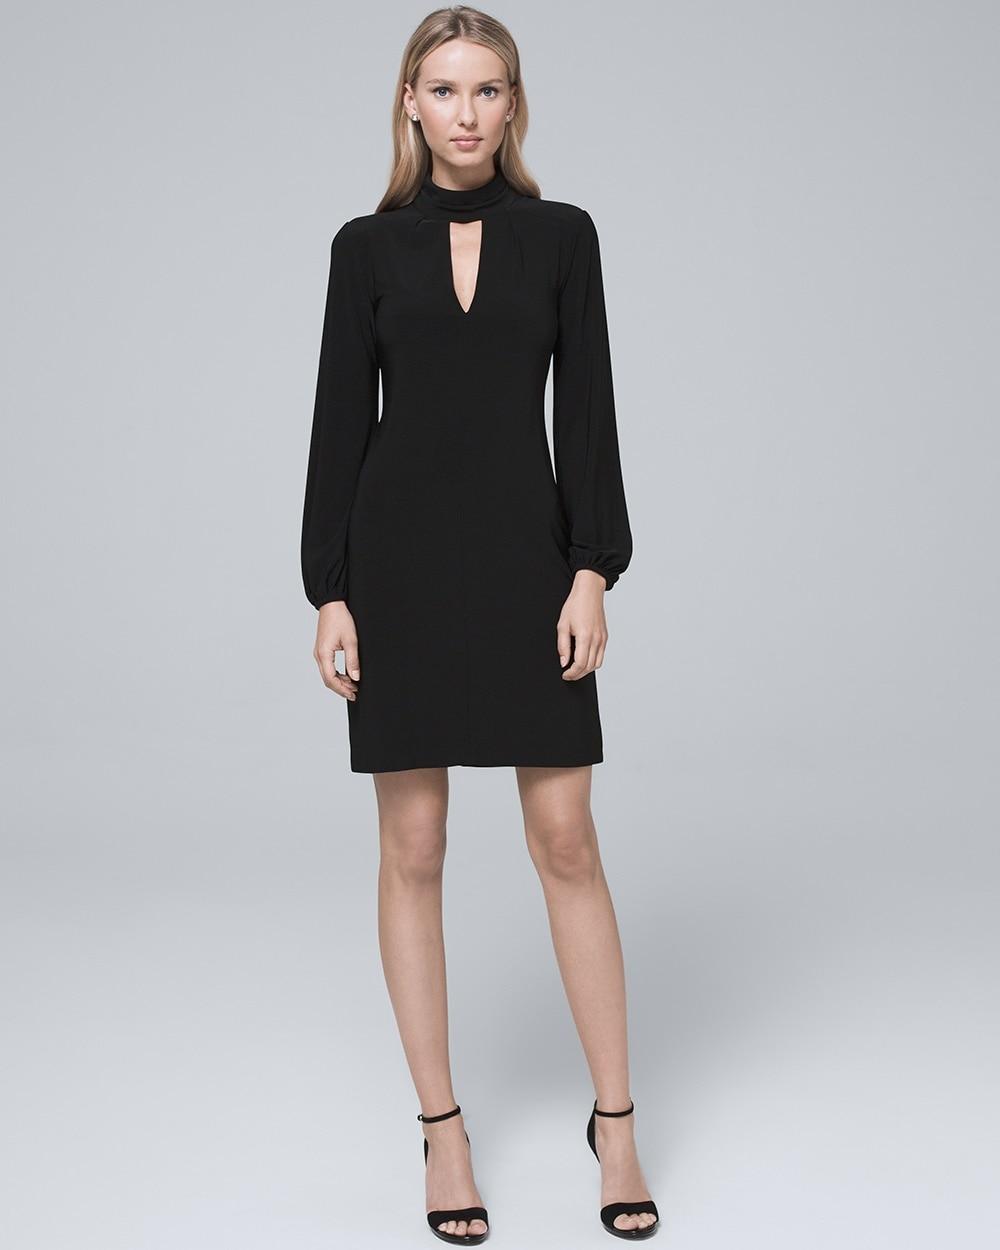 d51c312cbf Black Mock Neck Shift Dress - White House Black Market